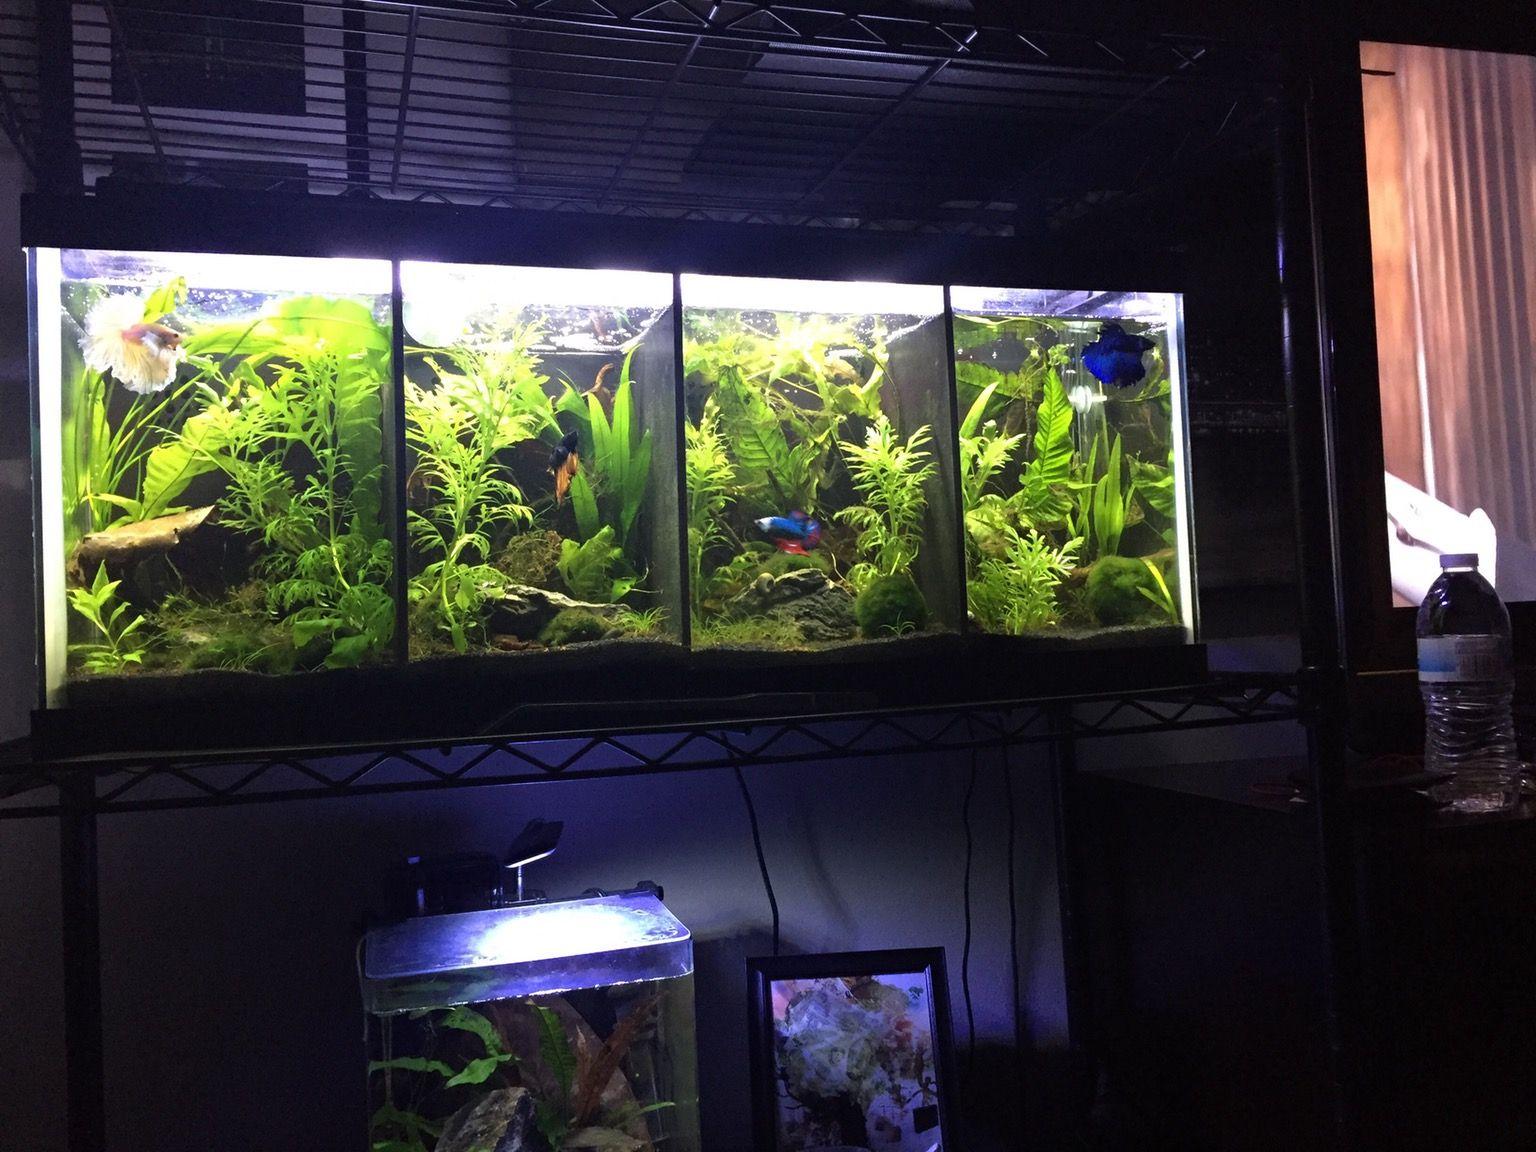 best divided betta tank i ve ever seen 20gal with live plants rh pinterest com best fish aquarium ever best ever aquarium light